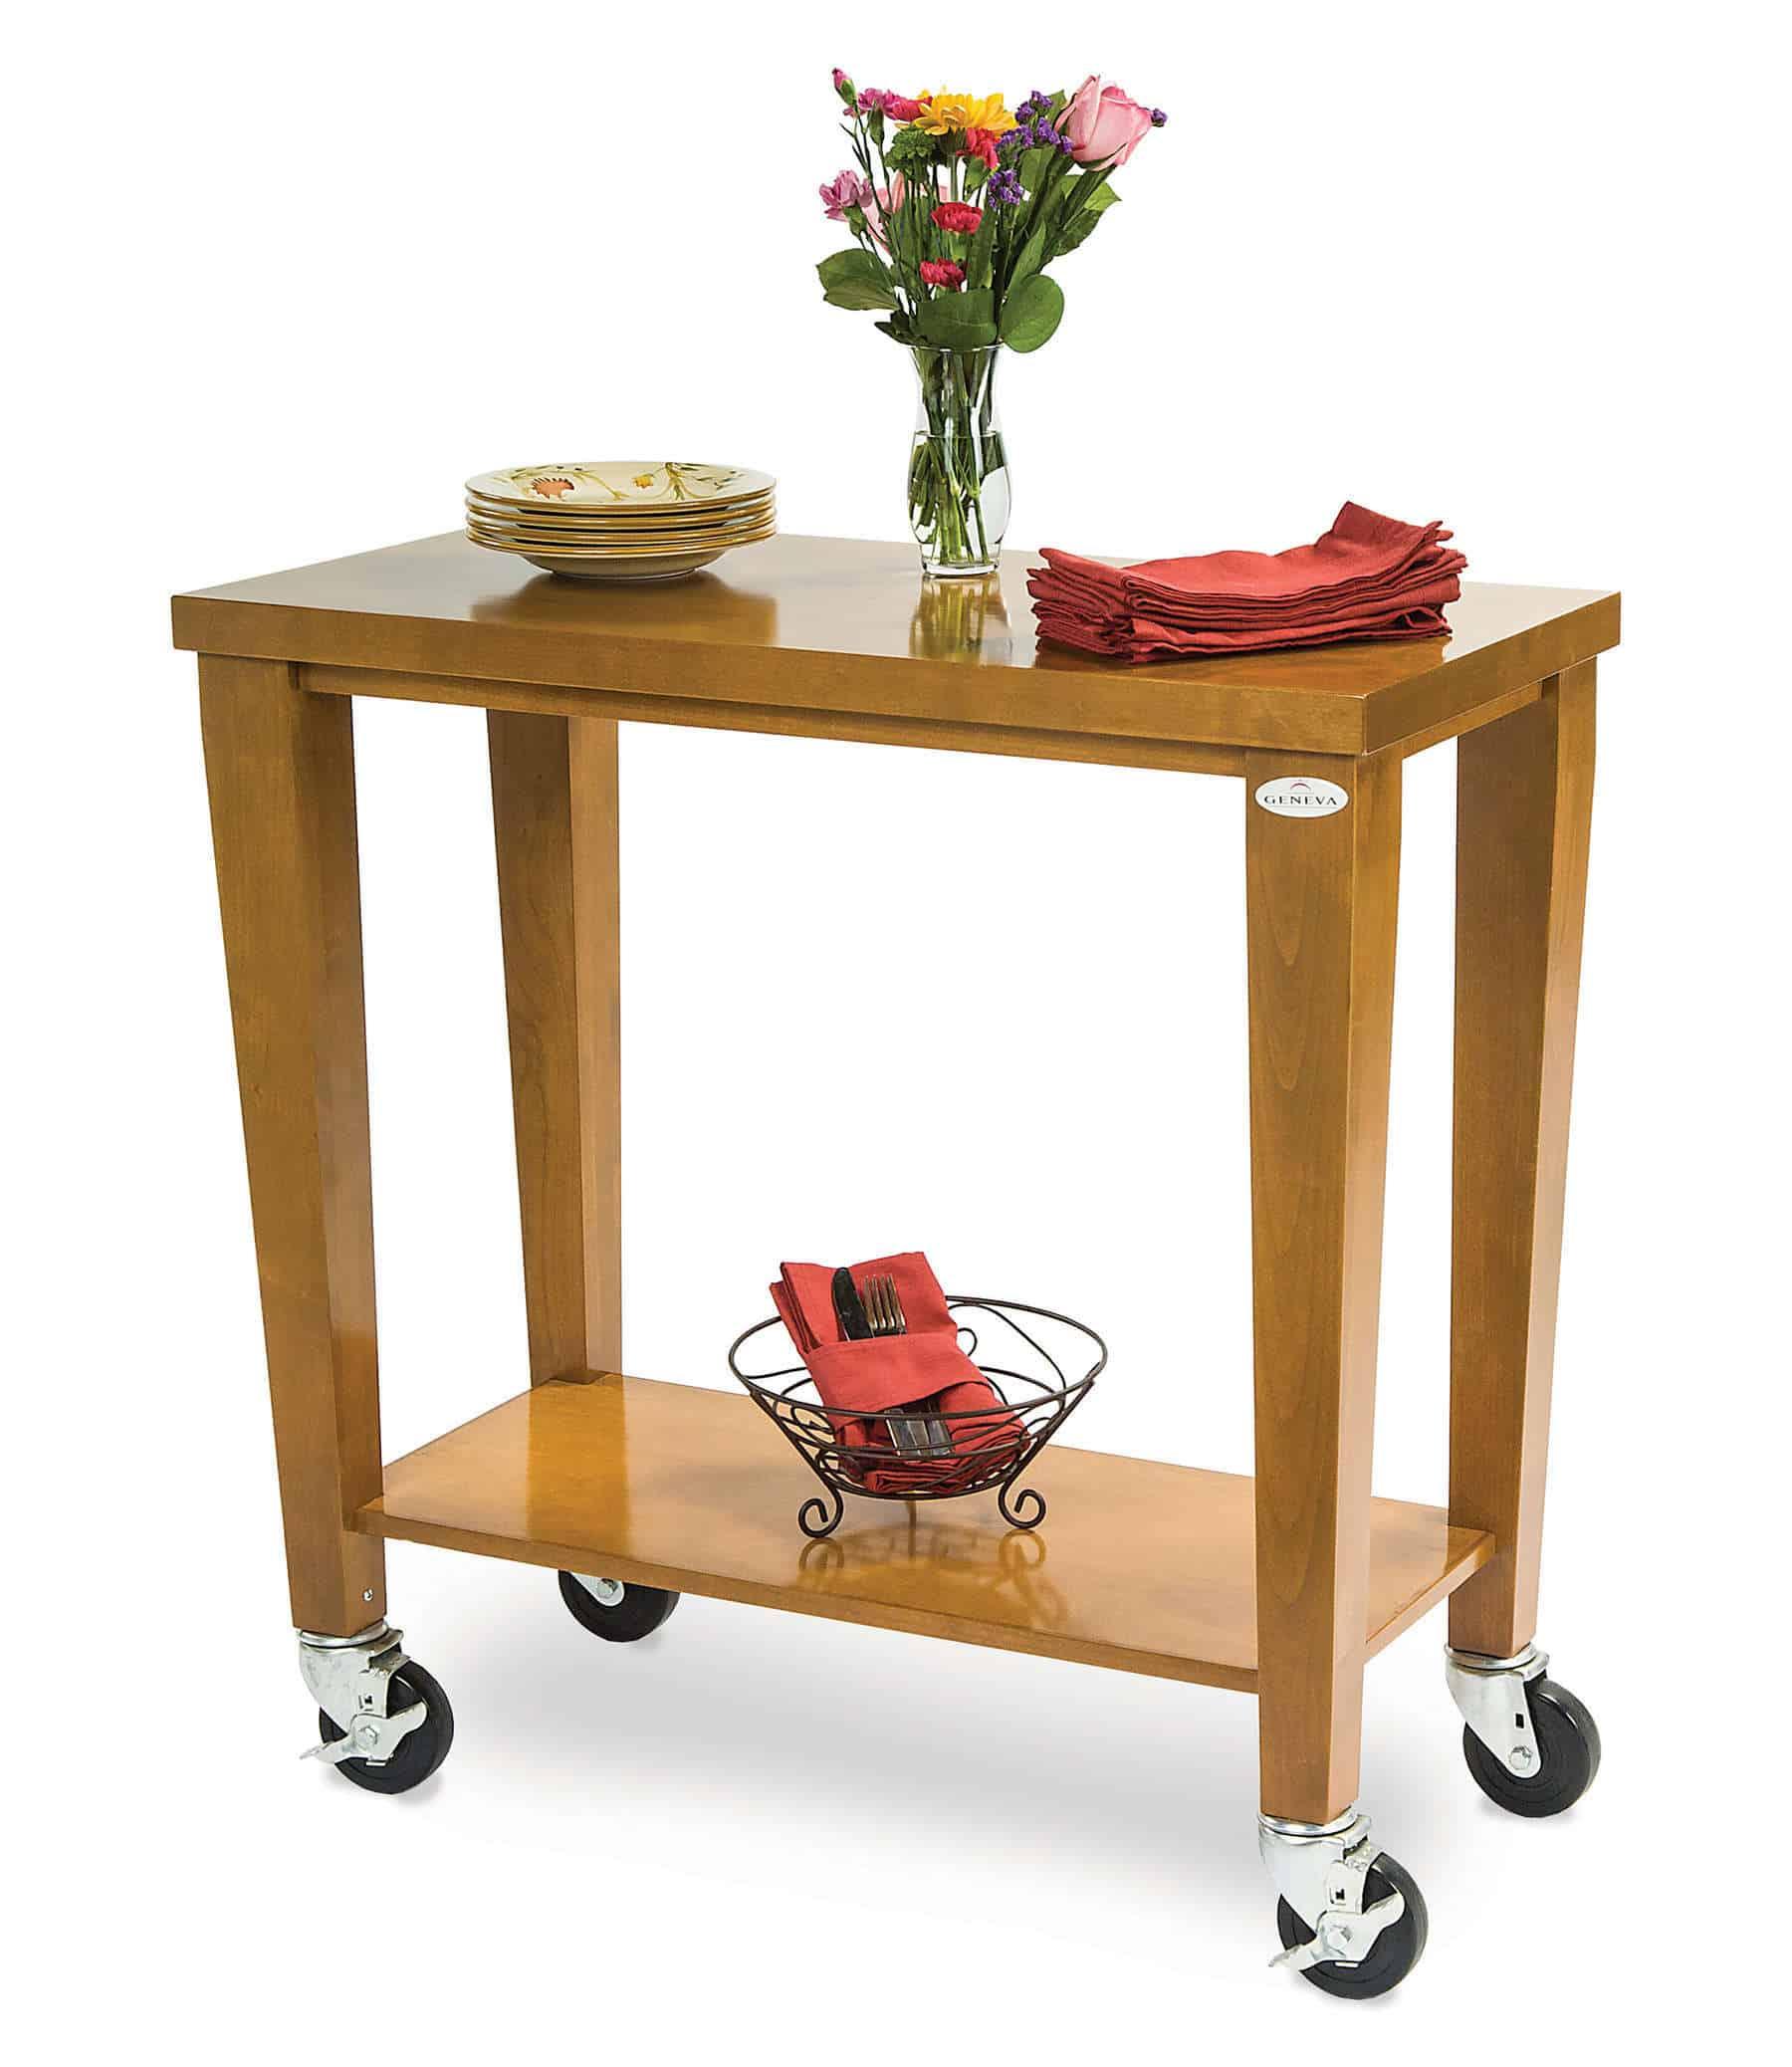 Geneva 79984 Serving Cart | Kitchen Equipment | CKitchen.com